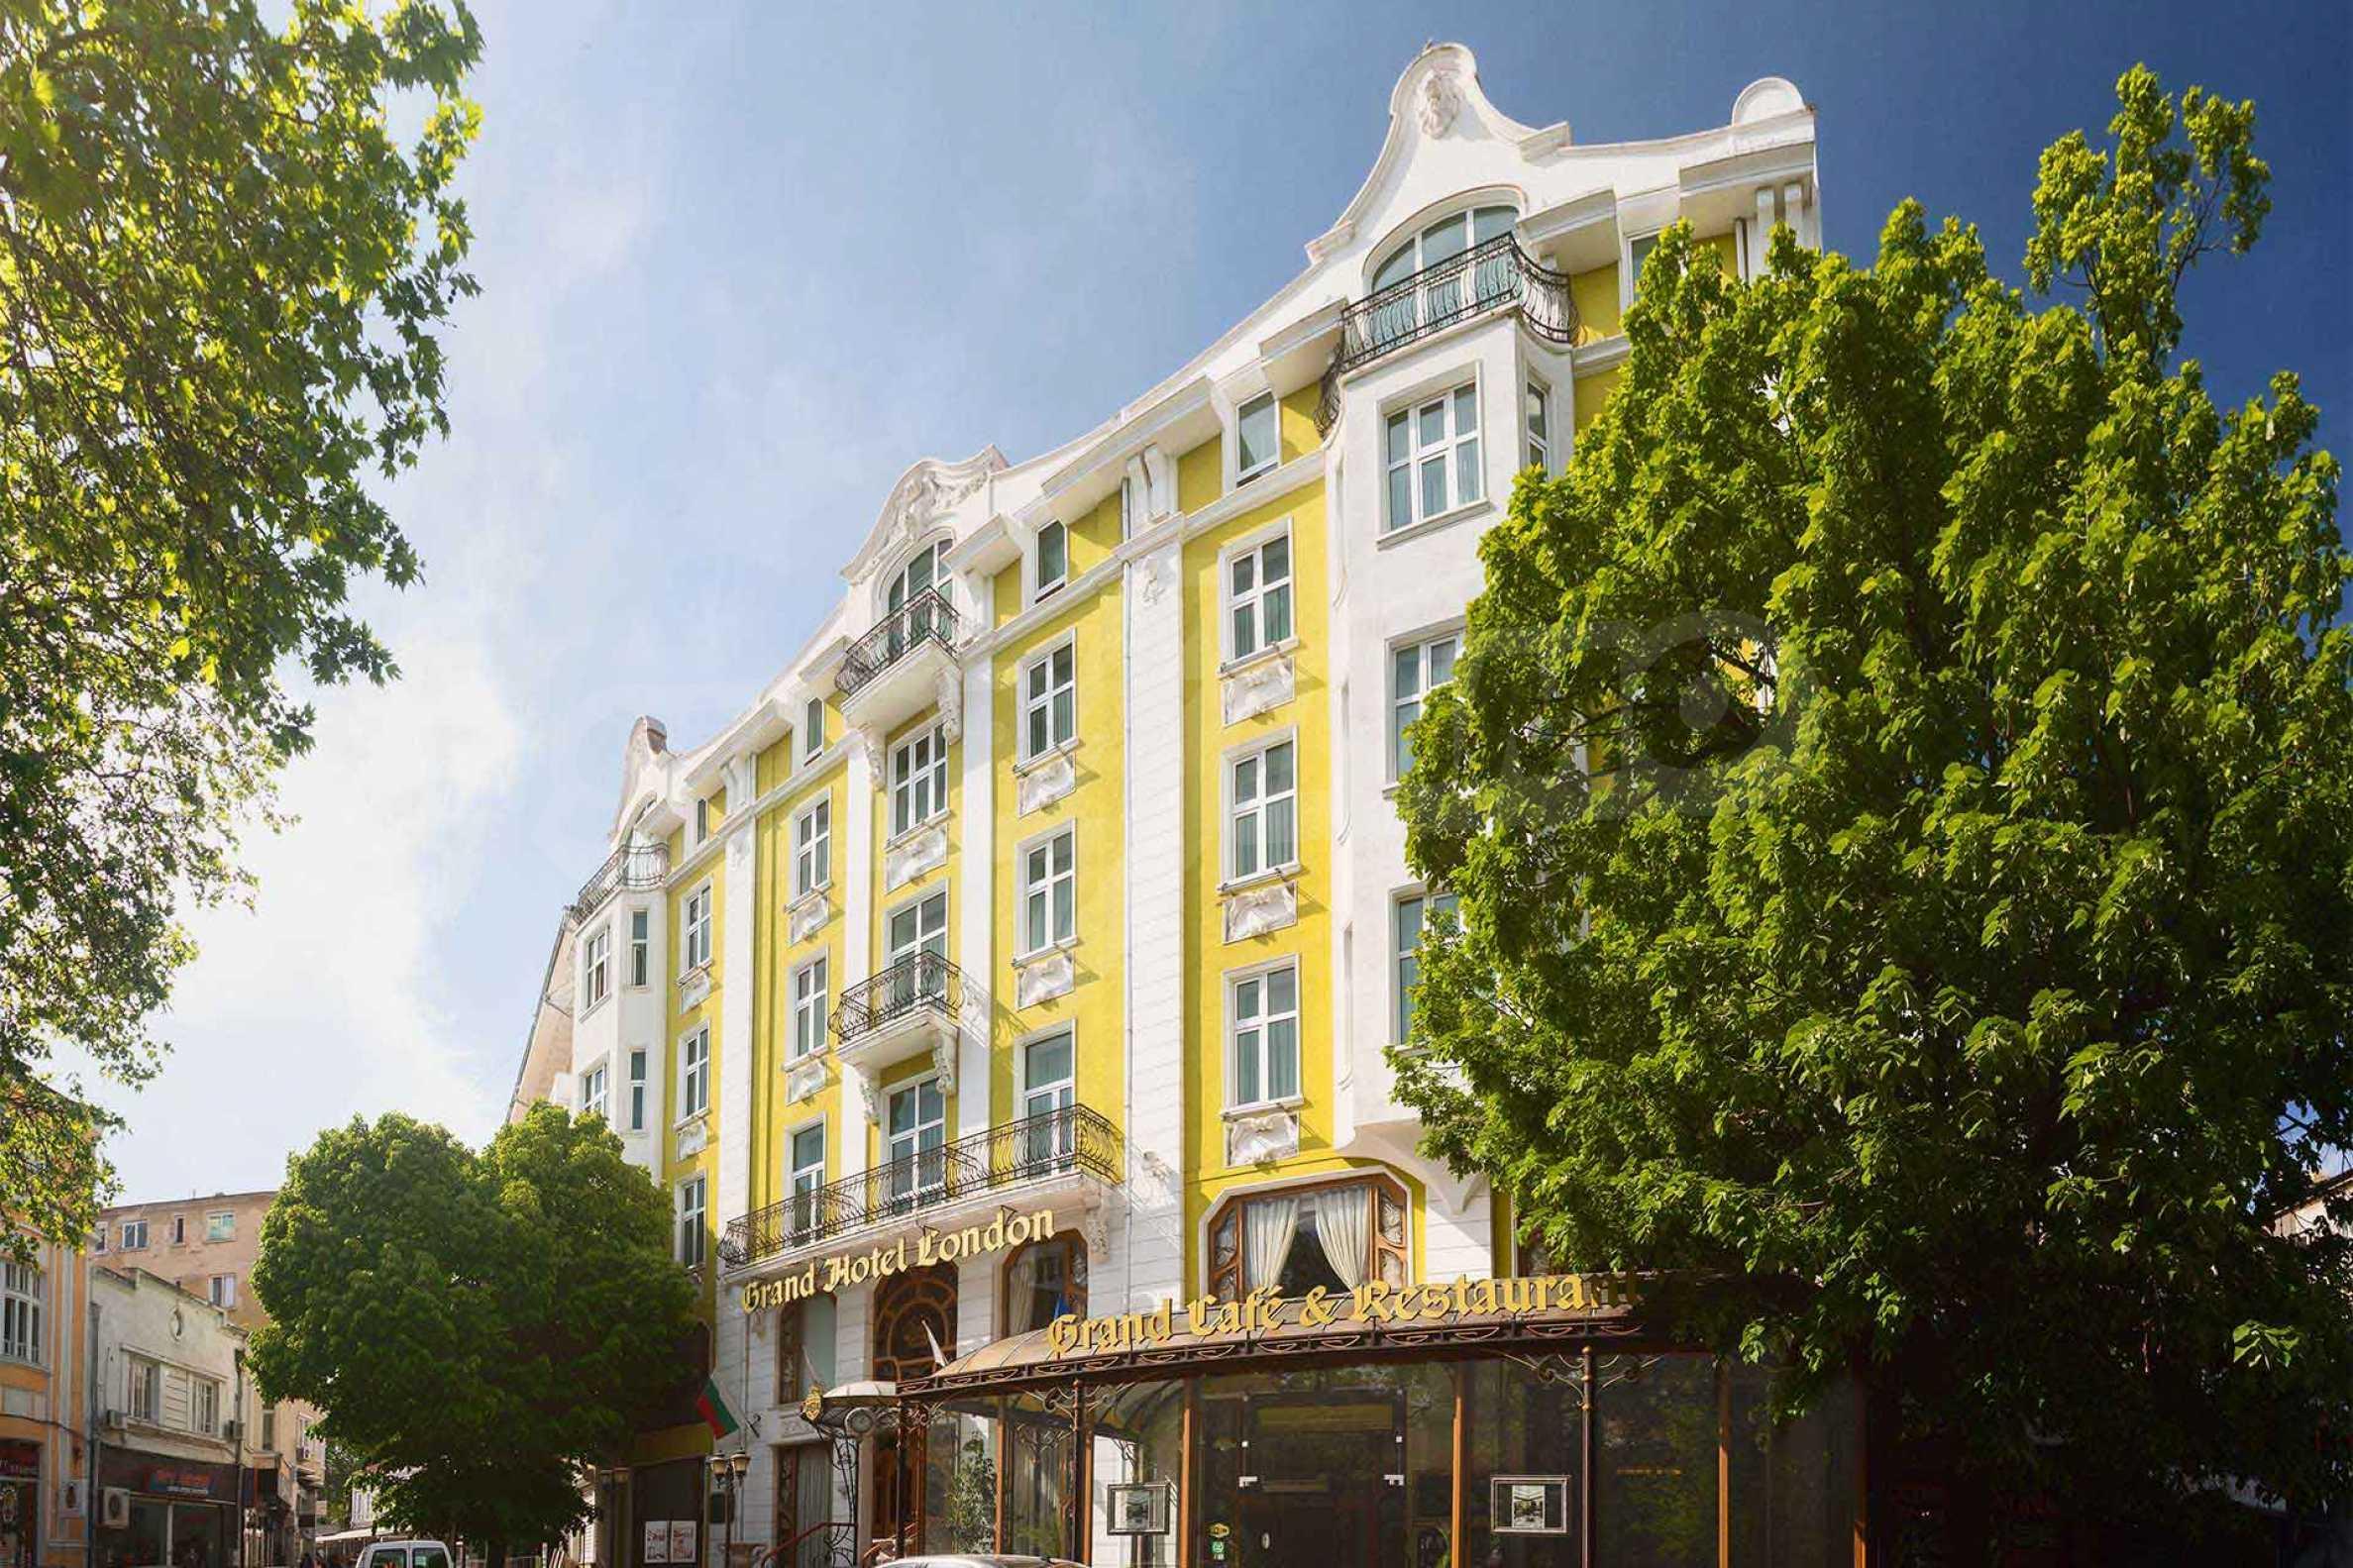 Luxurous 5* hotel